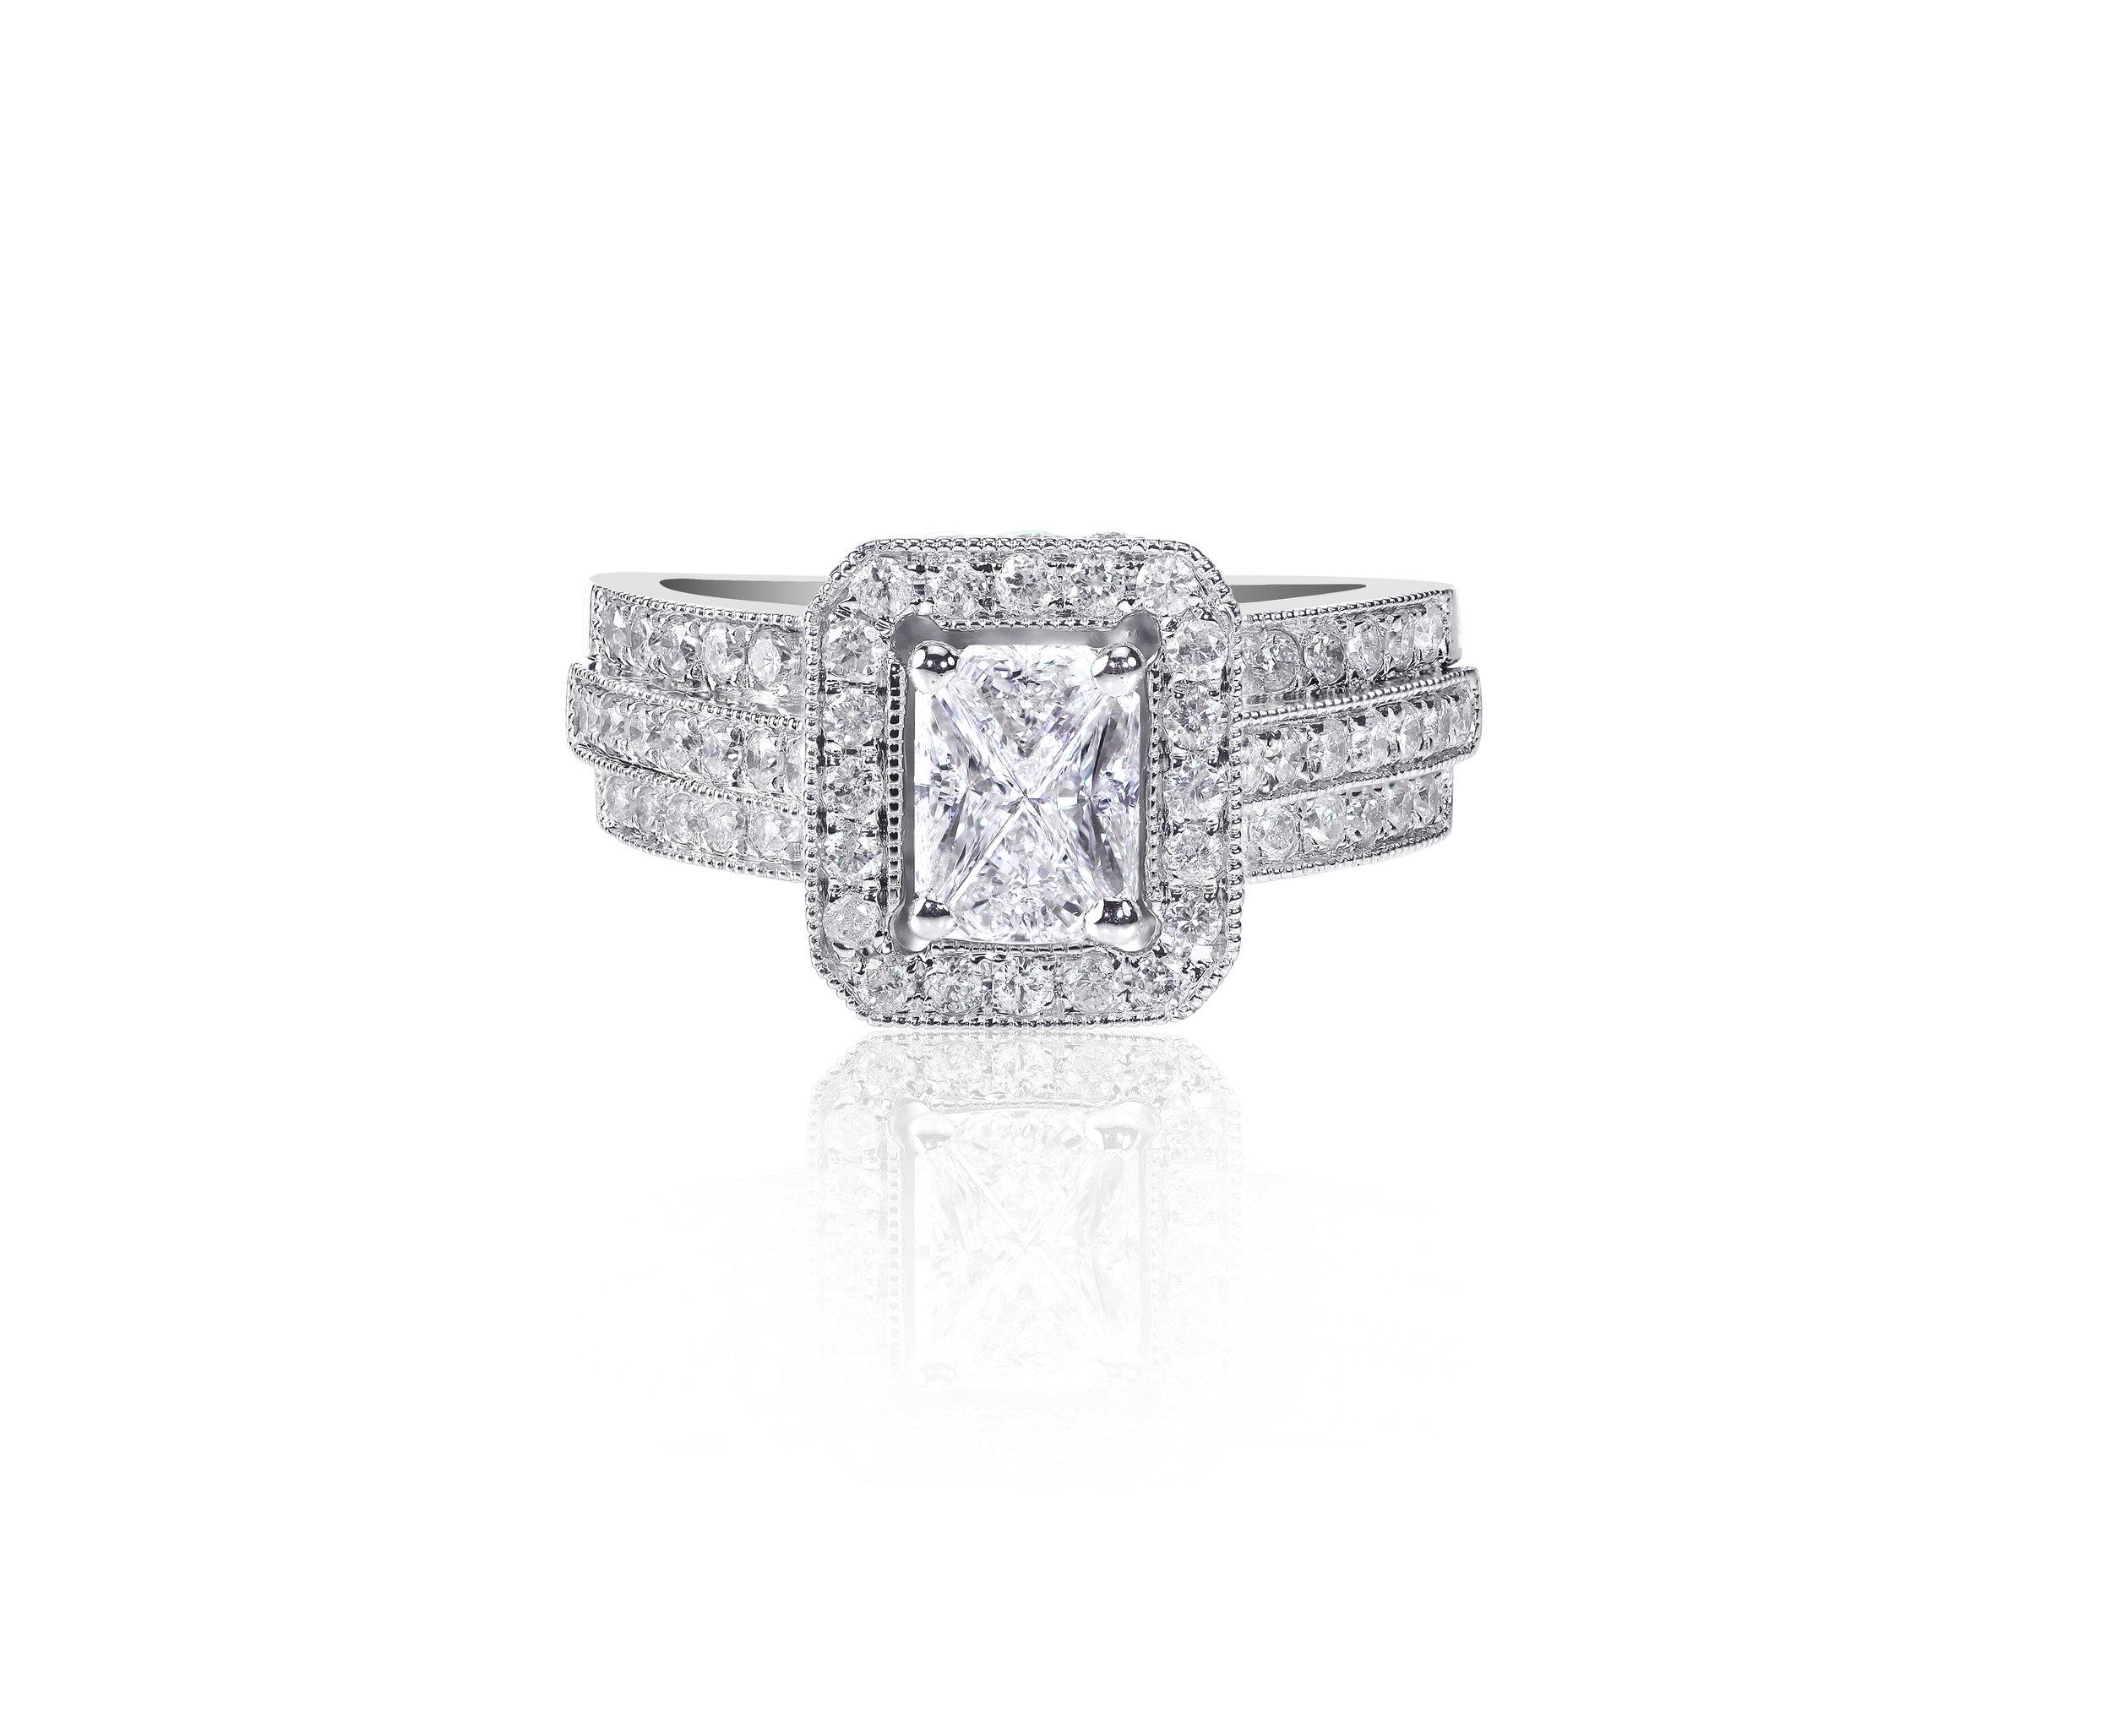 Cushion Cut Diamond Engagement Set